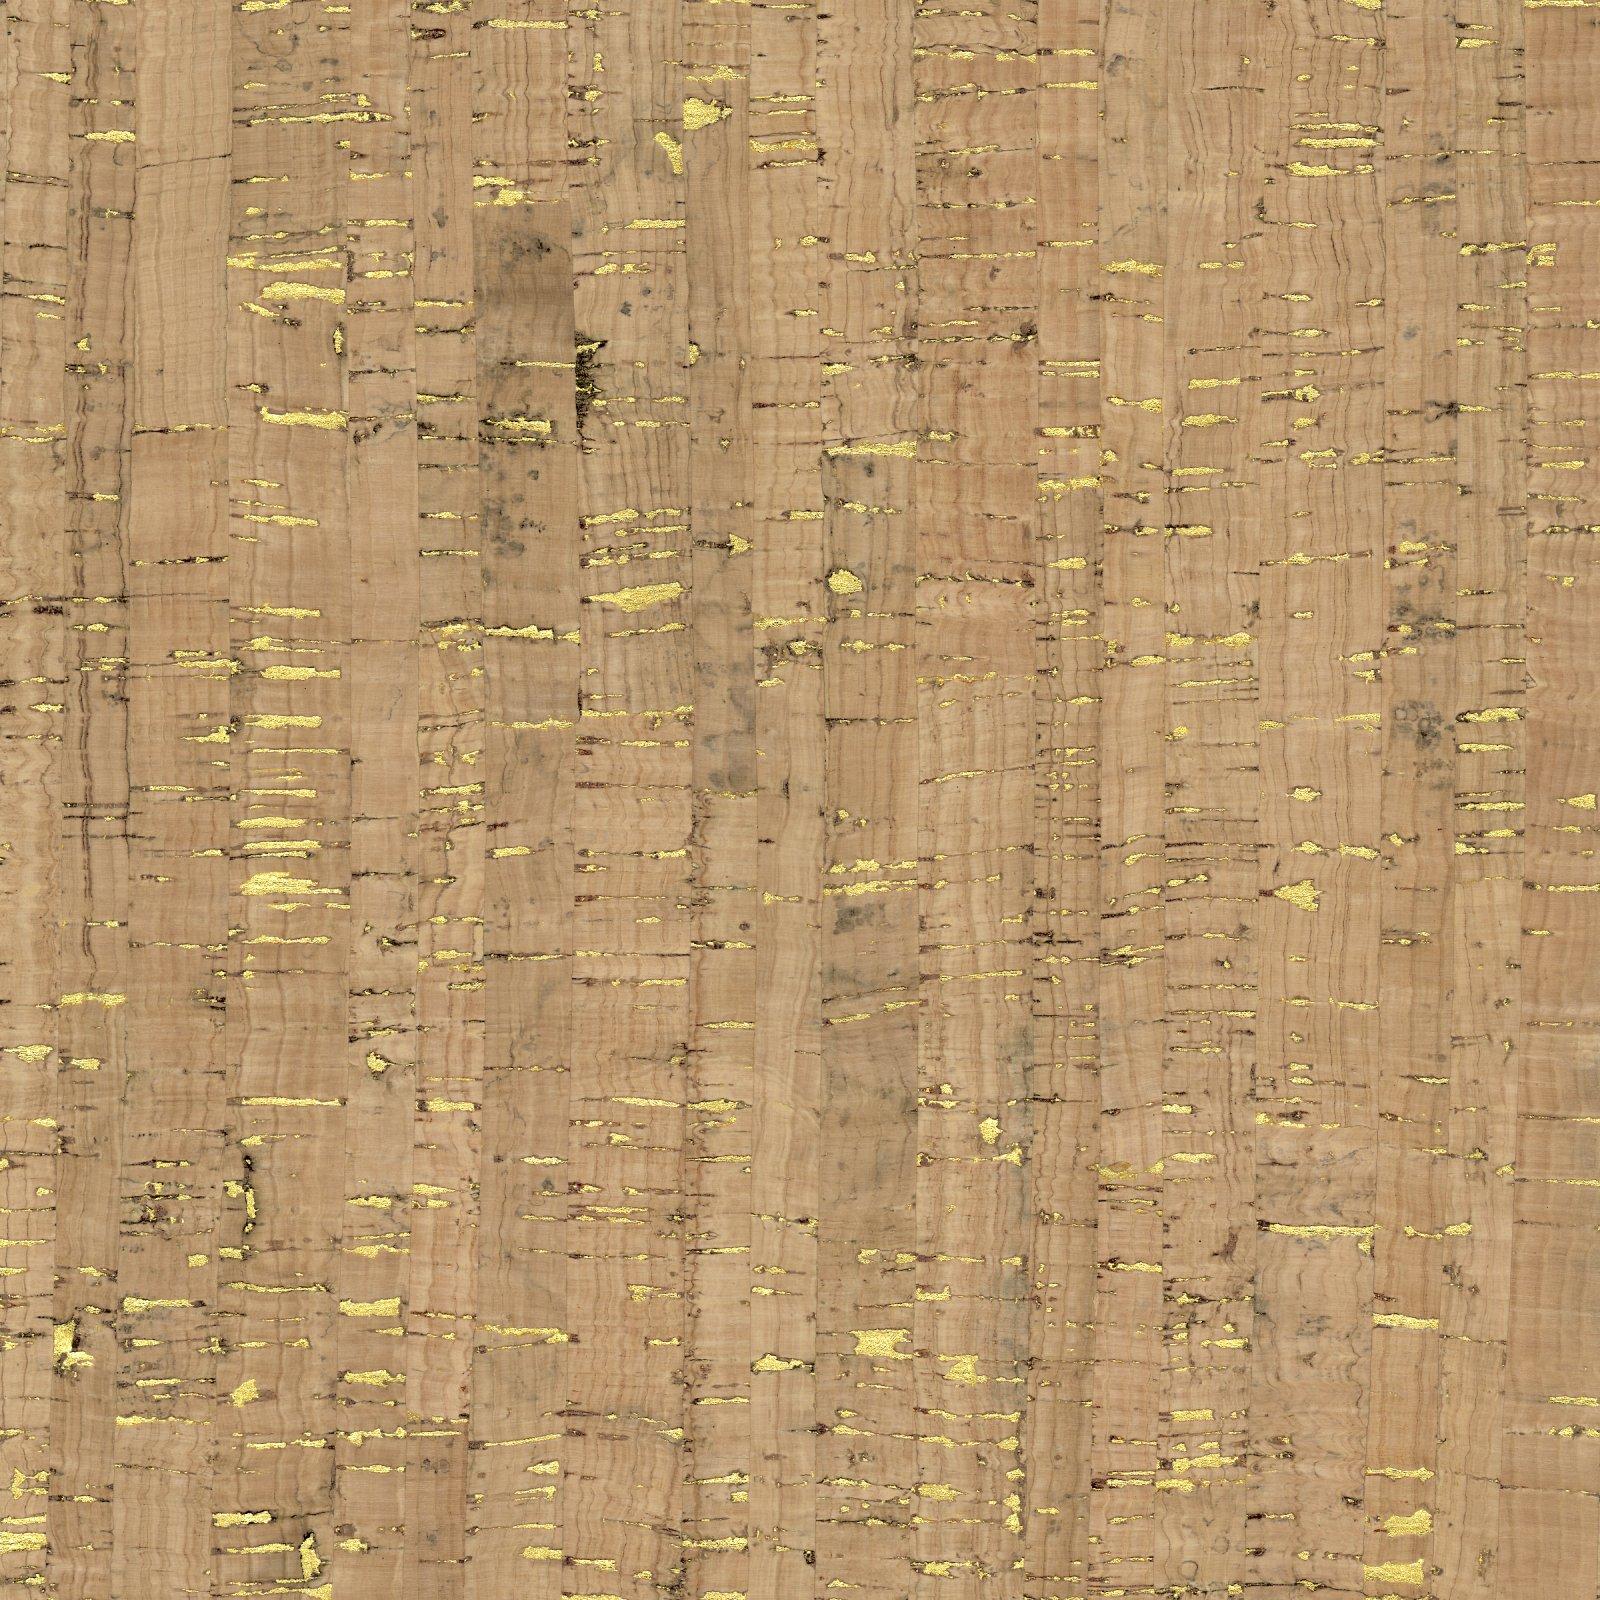 Natural Cork Fabric 36x52 - w/ Gold Flecks